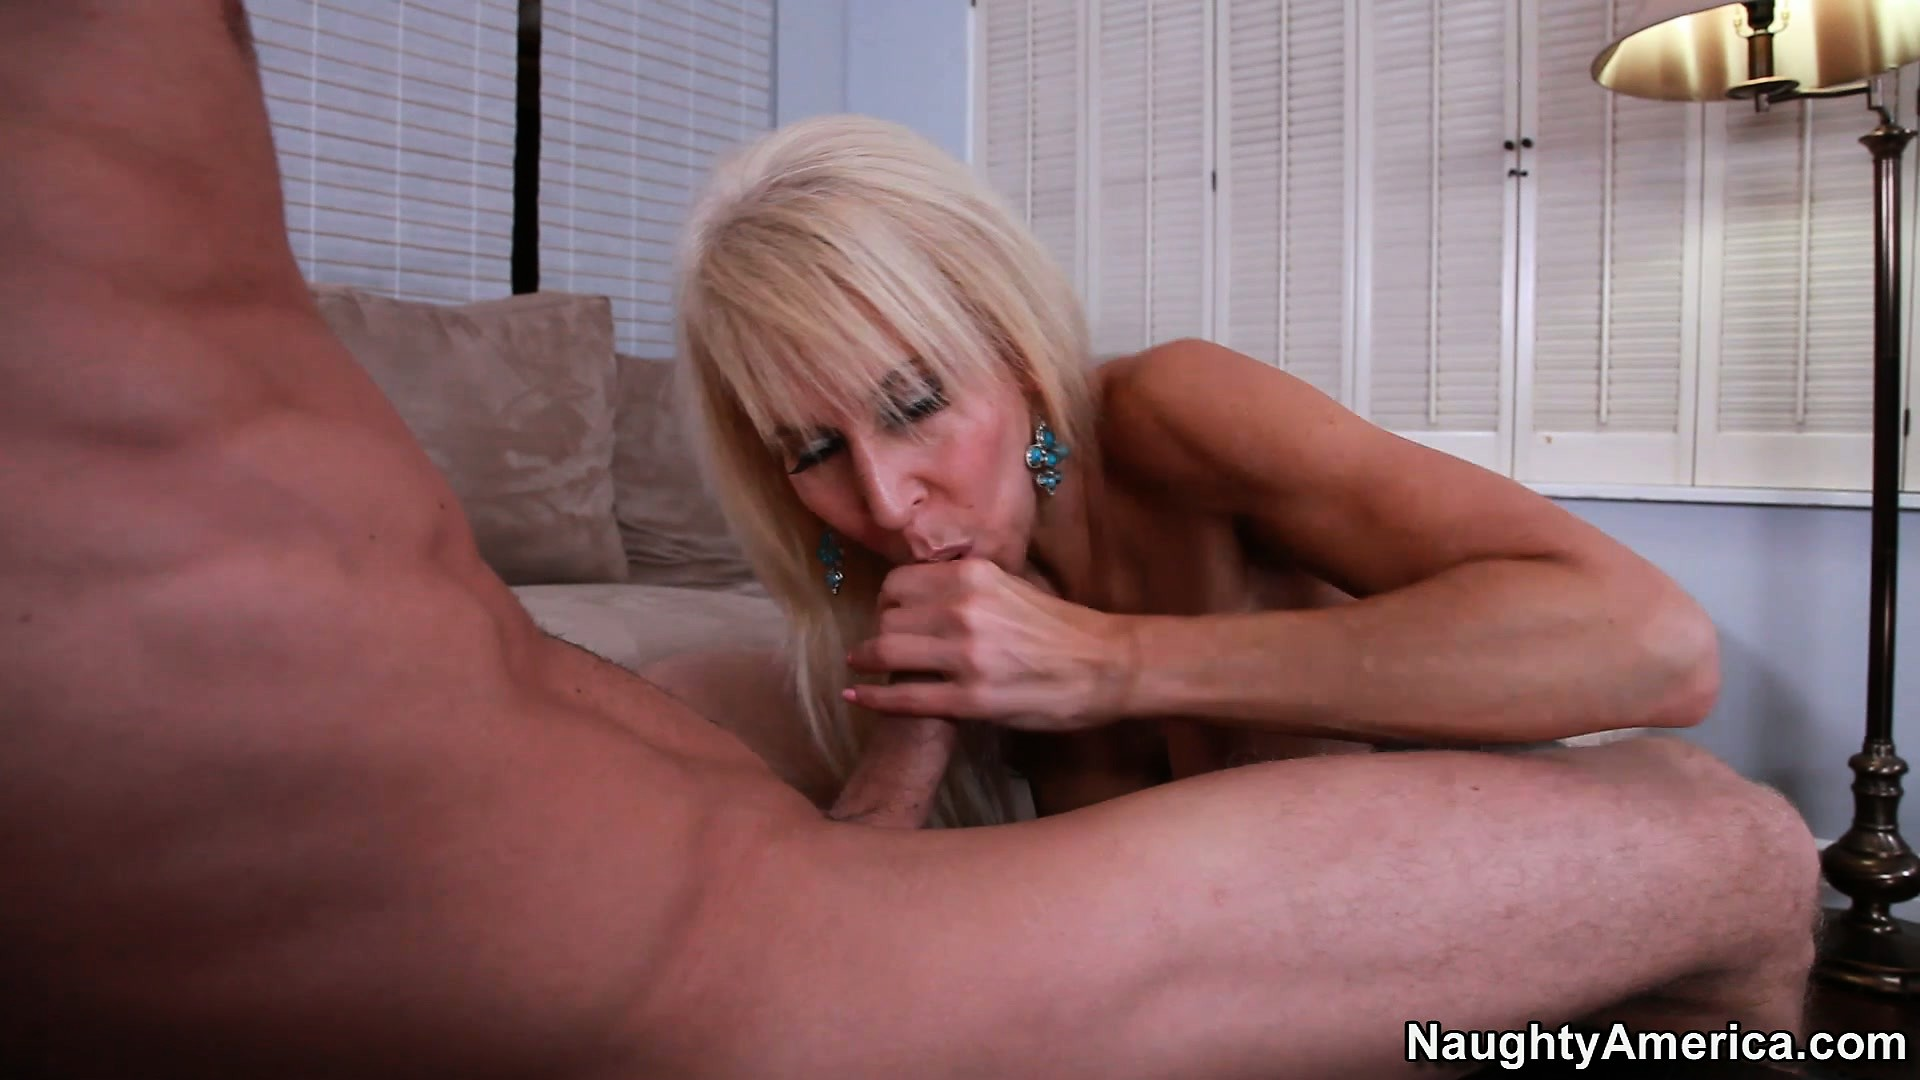 Porno Video of Slutty Mature Blonde Erica Lauren Gets Naked And Blows His Boner